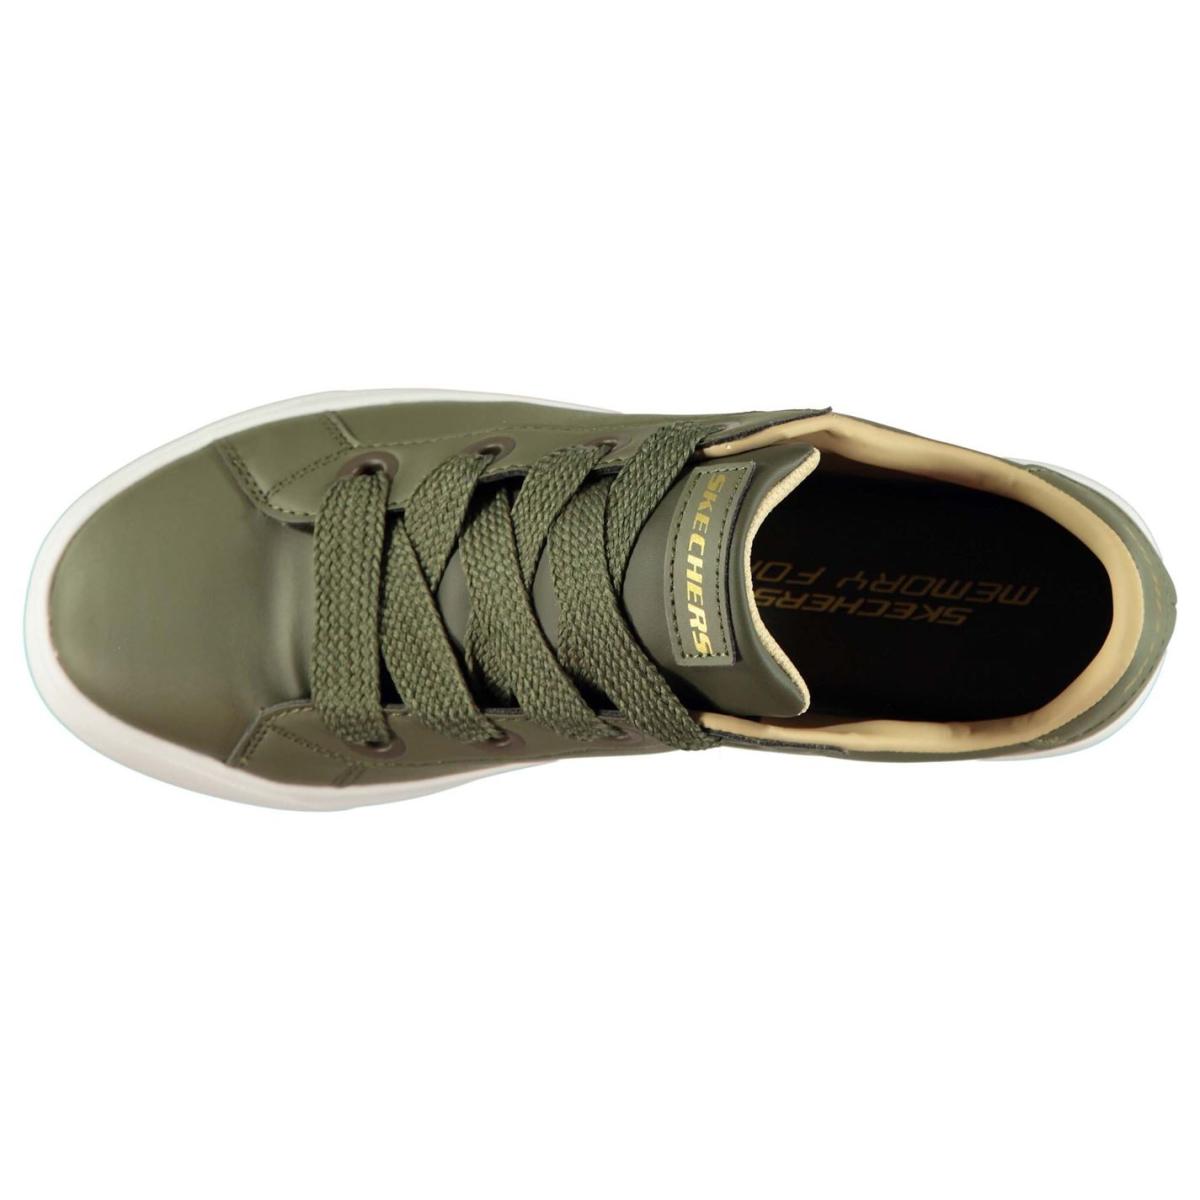 Skechers-Turnschuhe-Laufschuhe-Damen-Sneaker-Trainers-Sportschuhe-4032 Indexbild 7